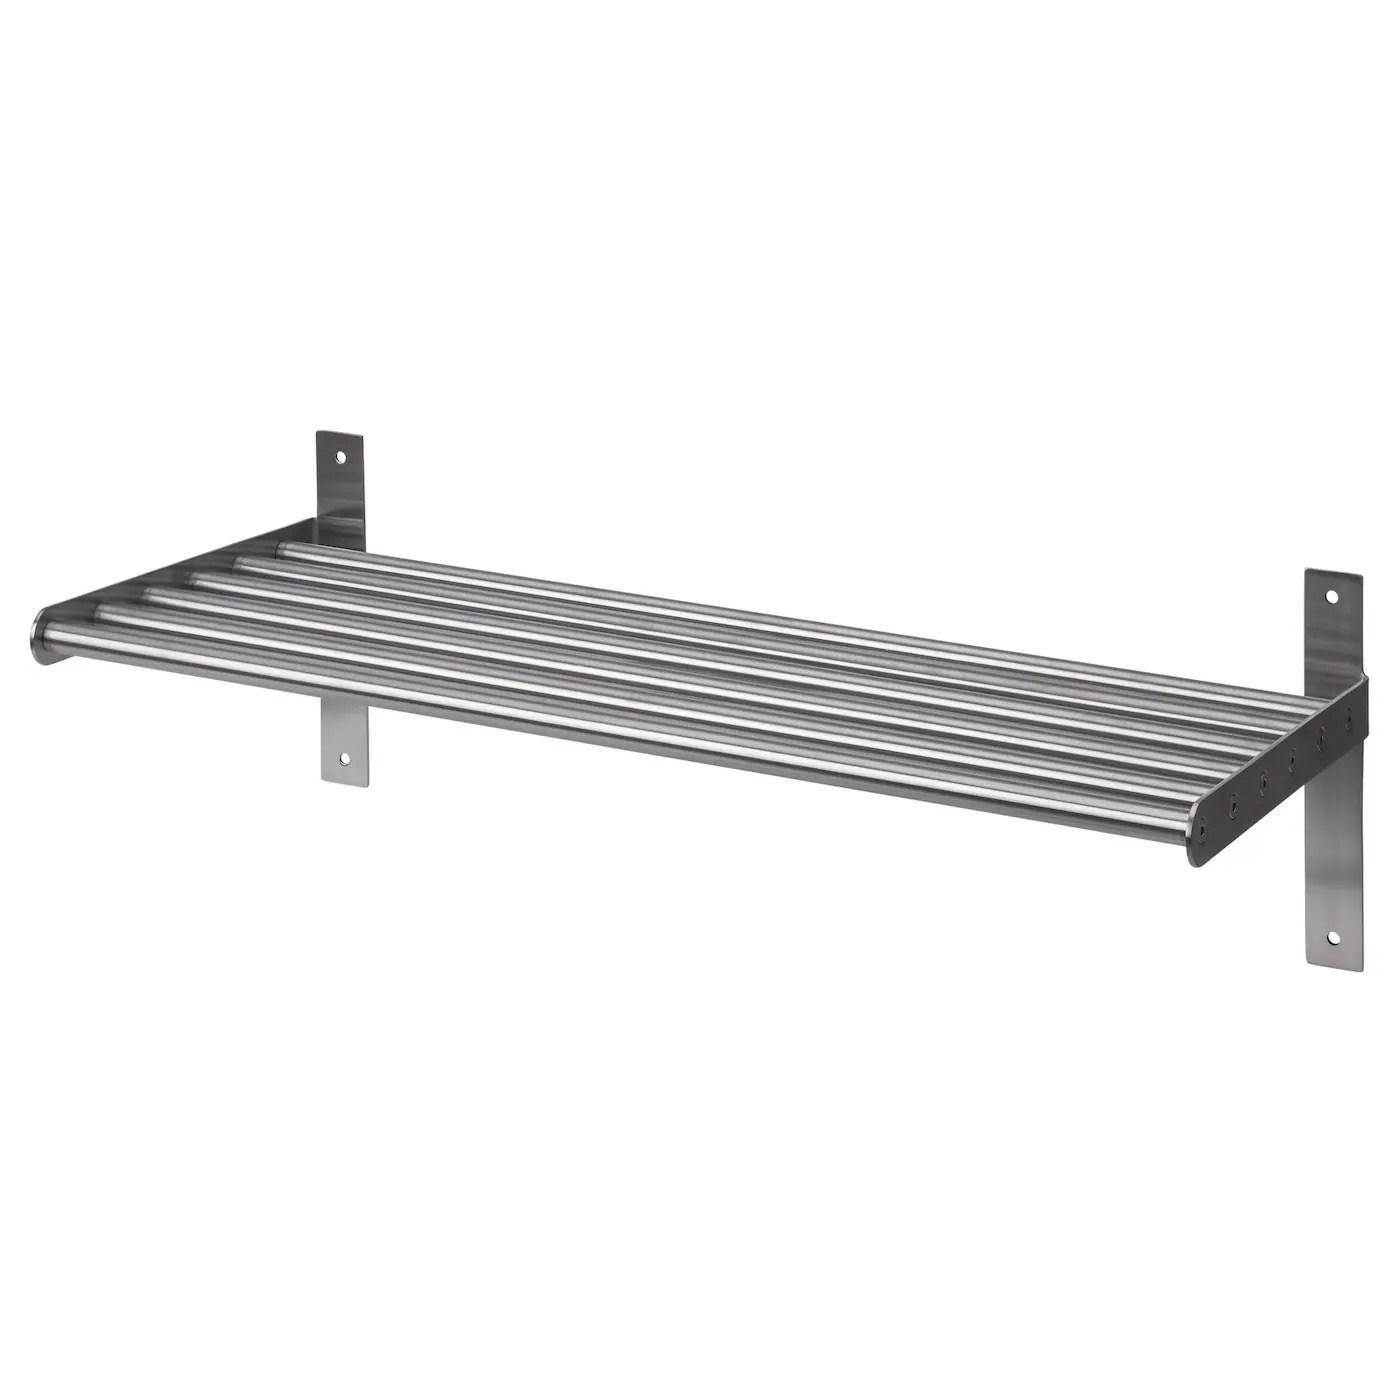 grundtal wall shelf stainless steel 60 cm